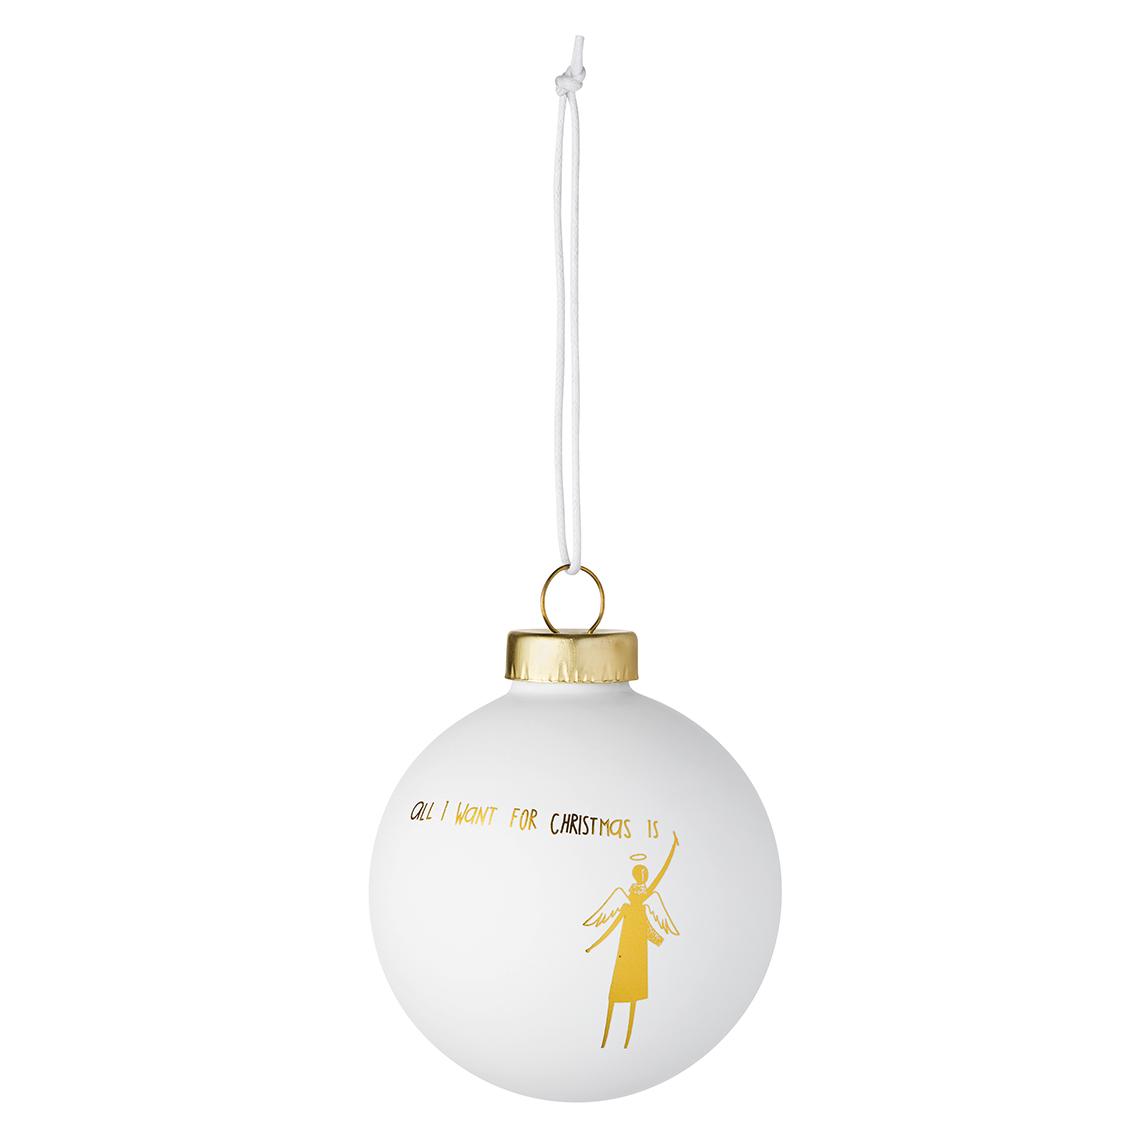 Räder Weihnachtskugeln.Winterwunderland Kugel All I Want For Christmas